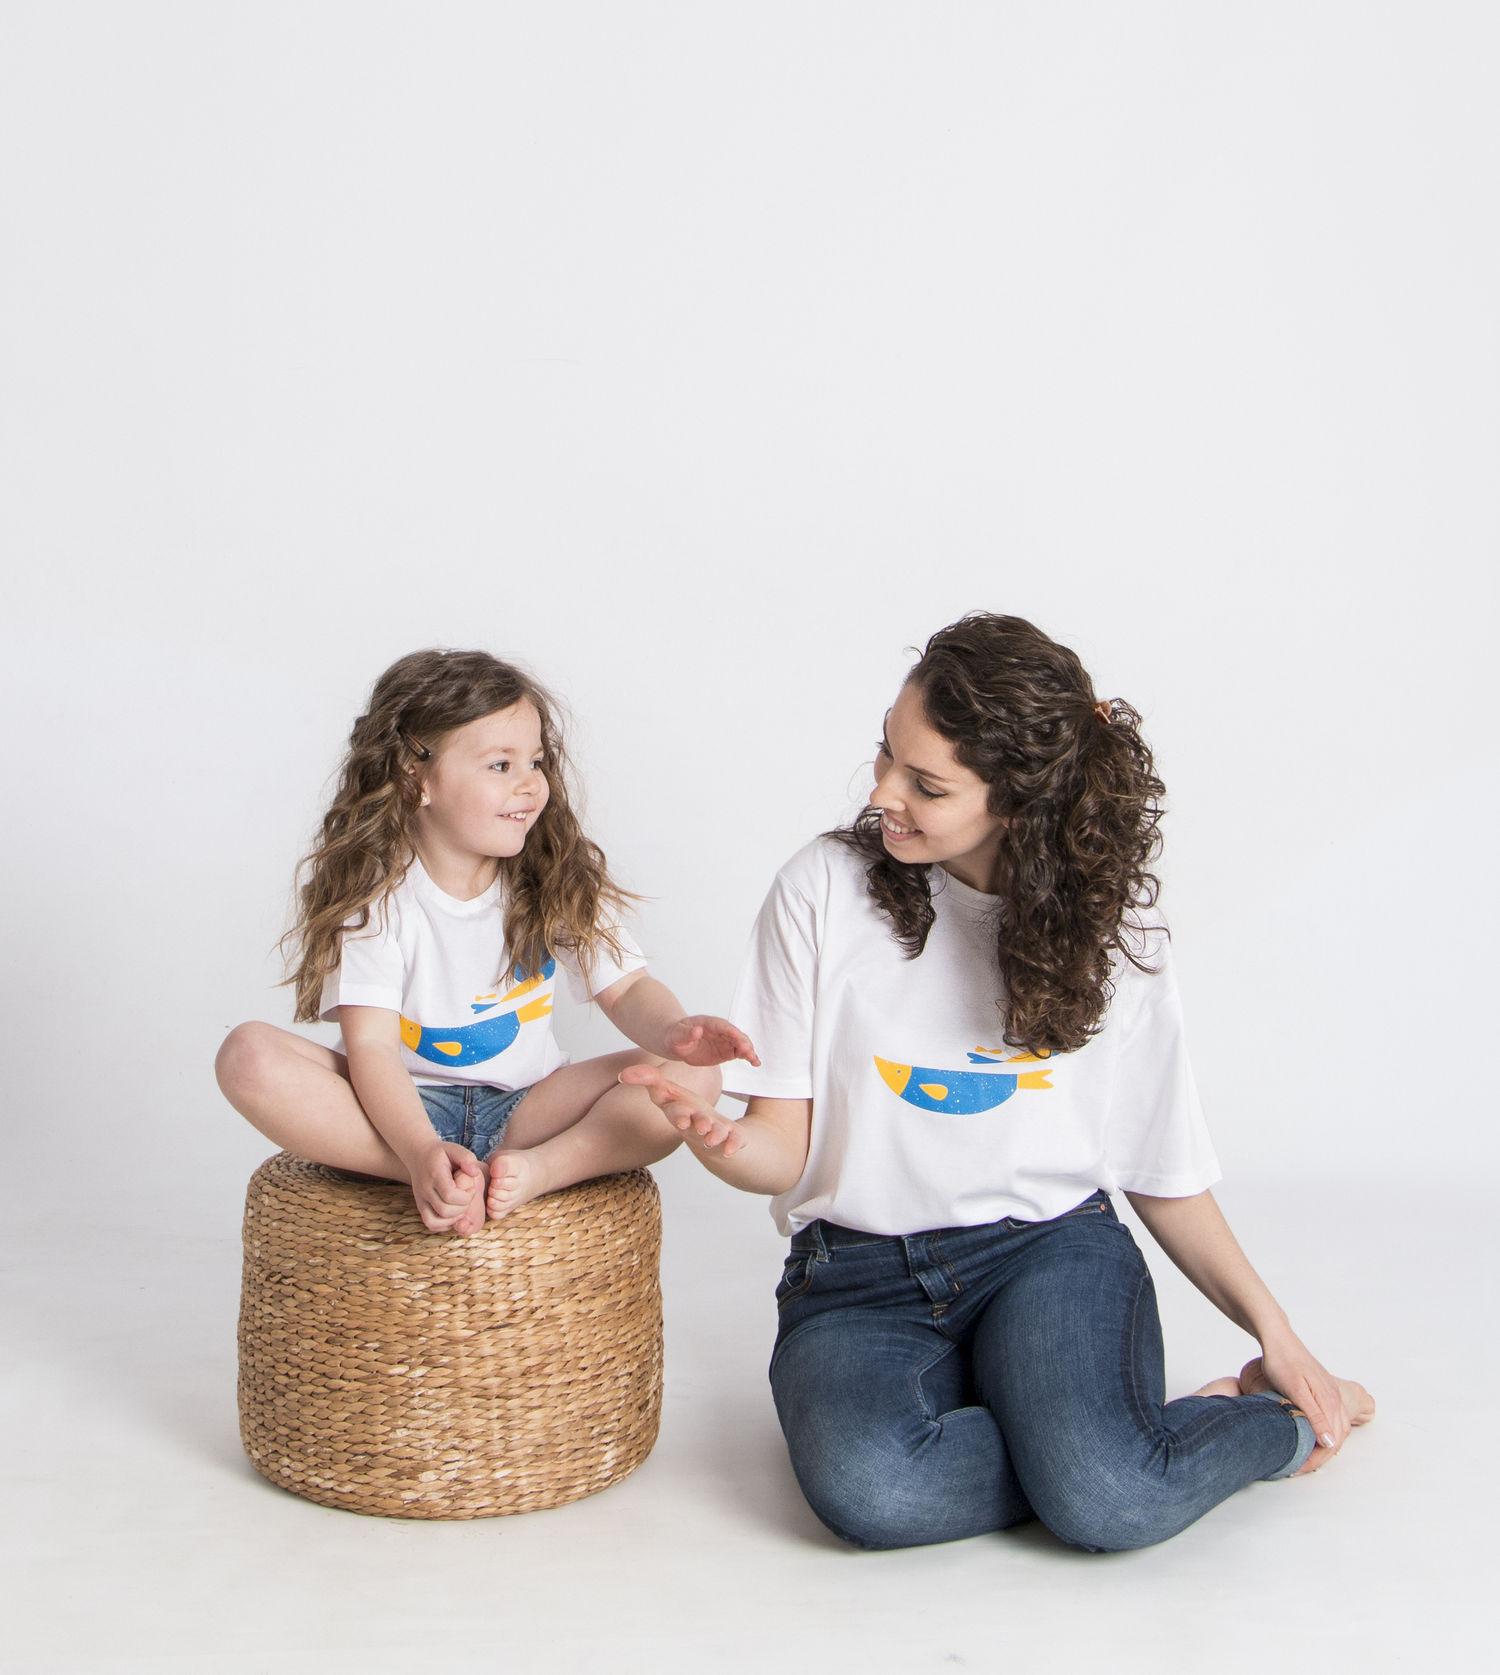 madre e hija iguales_camiseta peces.jpg